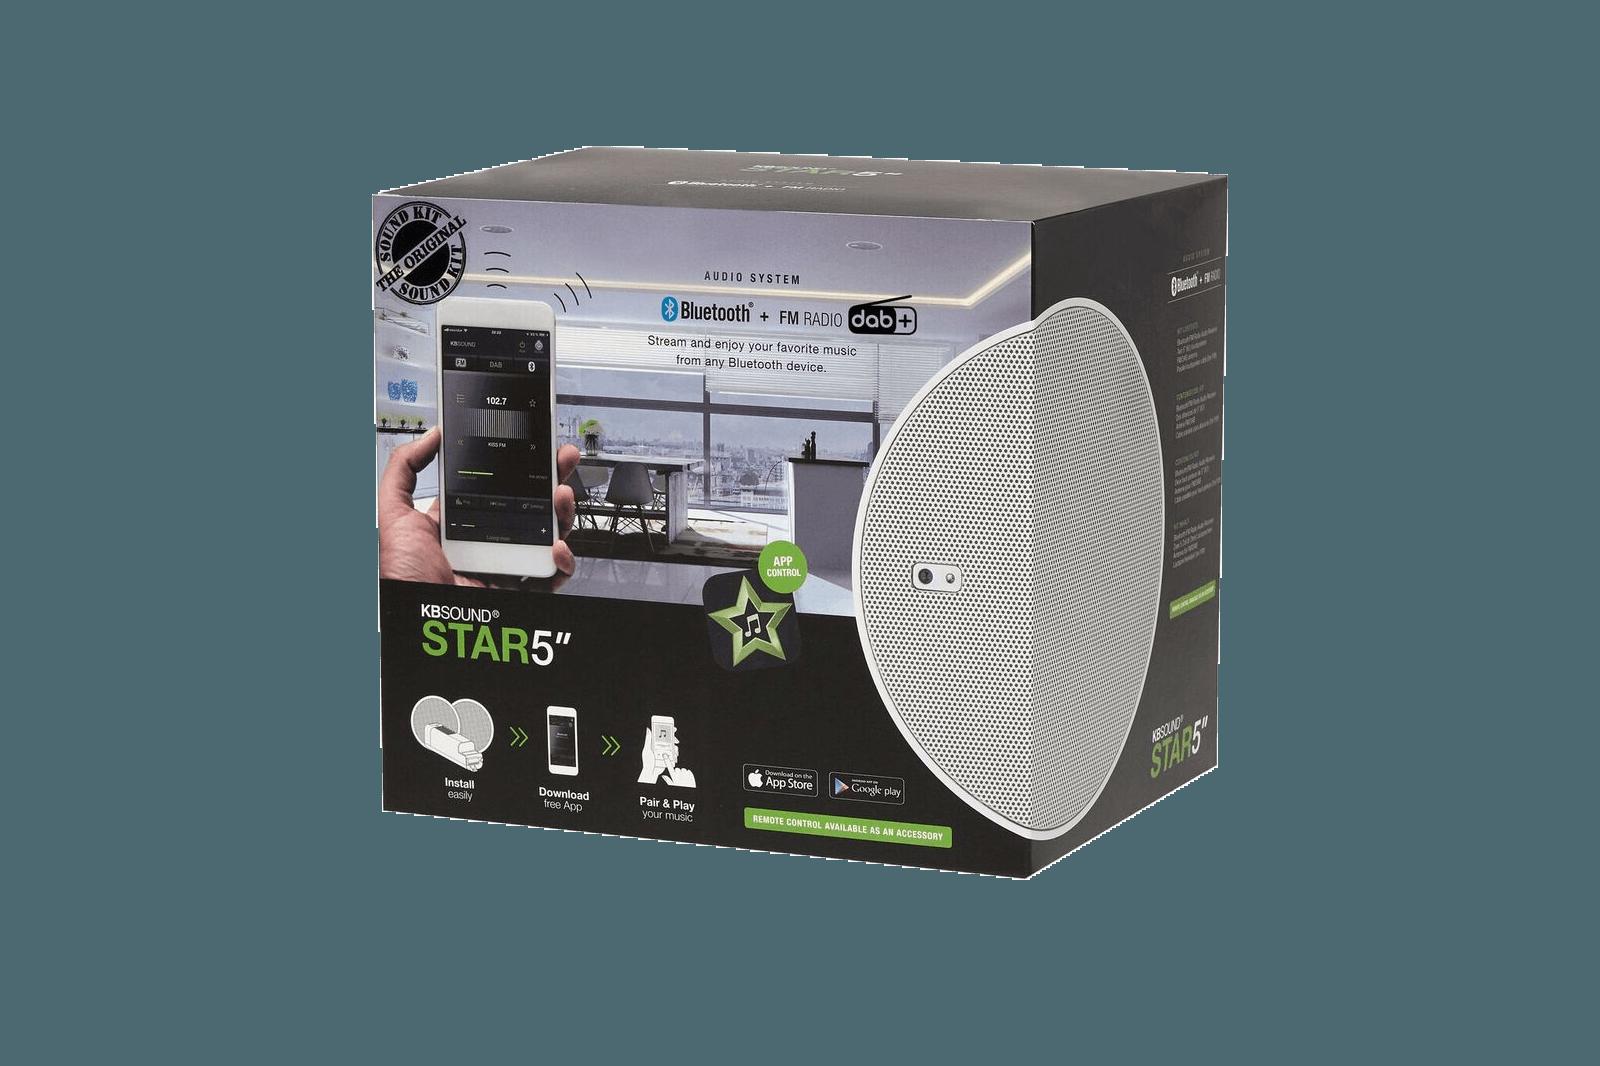 "KB Sound KB SOUND STAR 5"" DAB+/FM/Bluetooth"